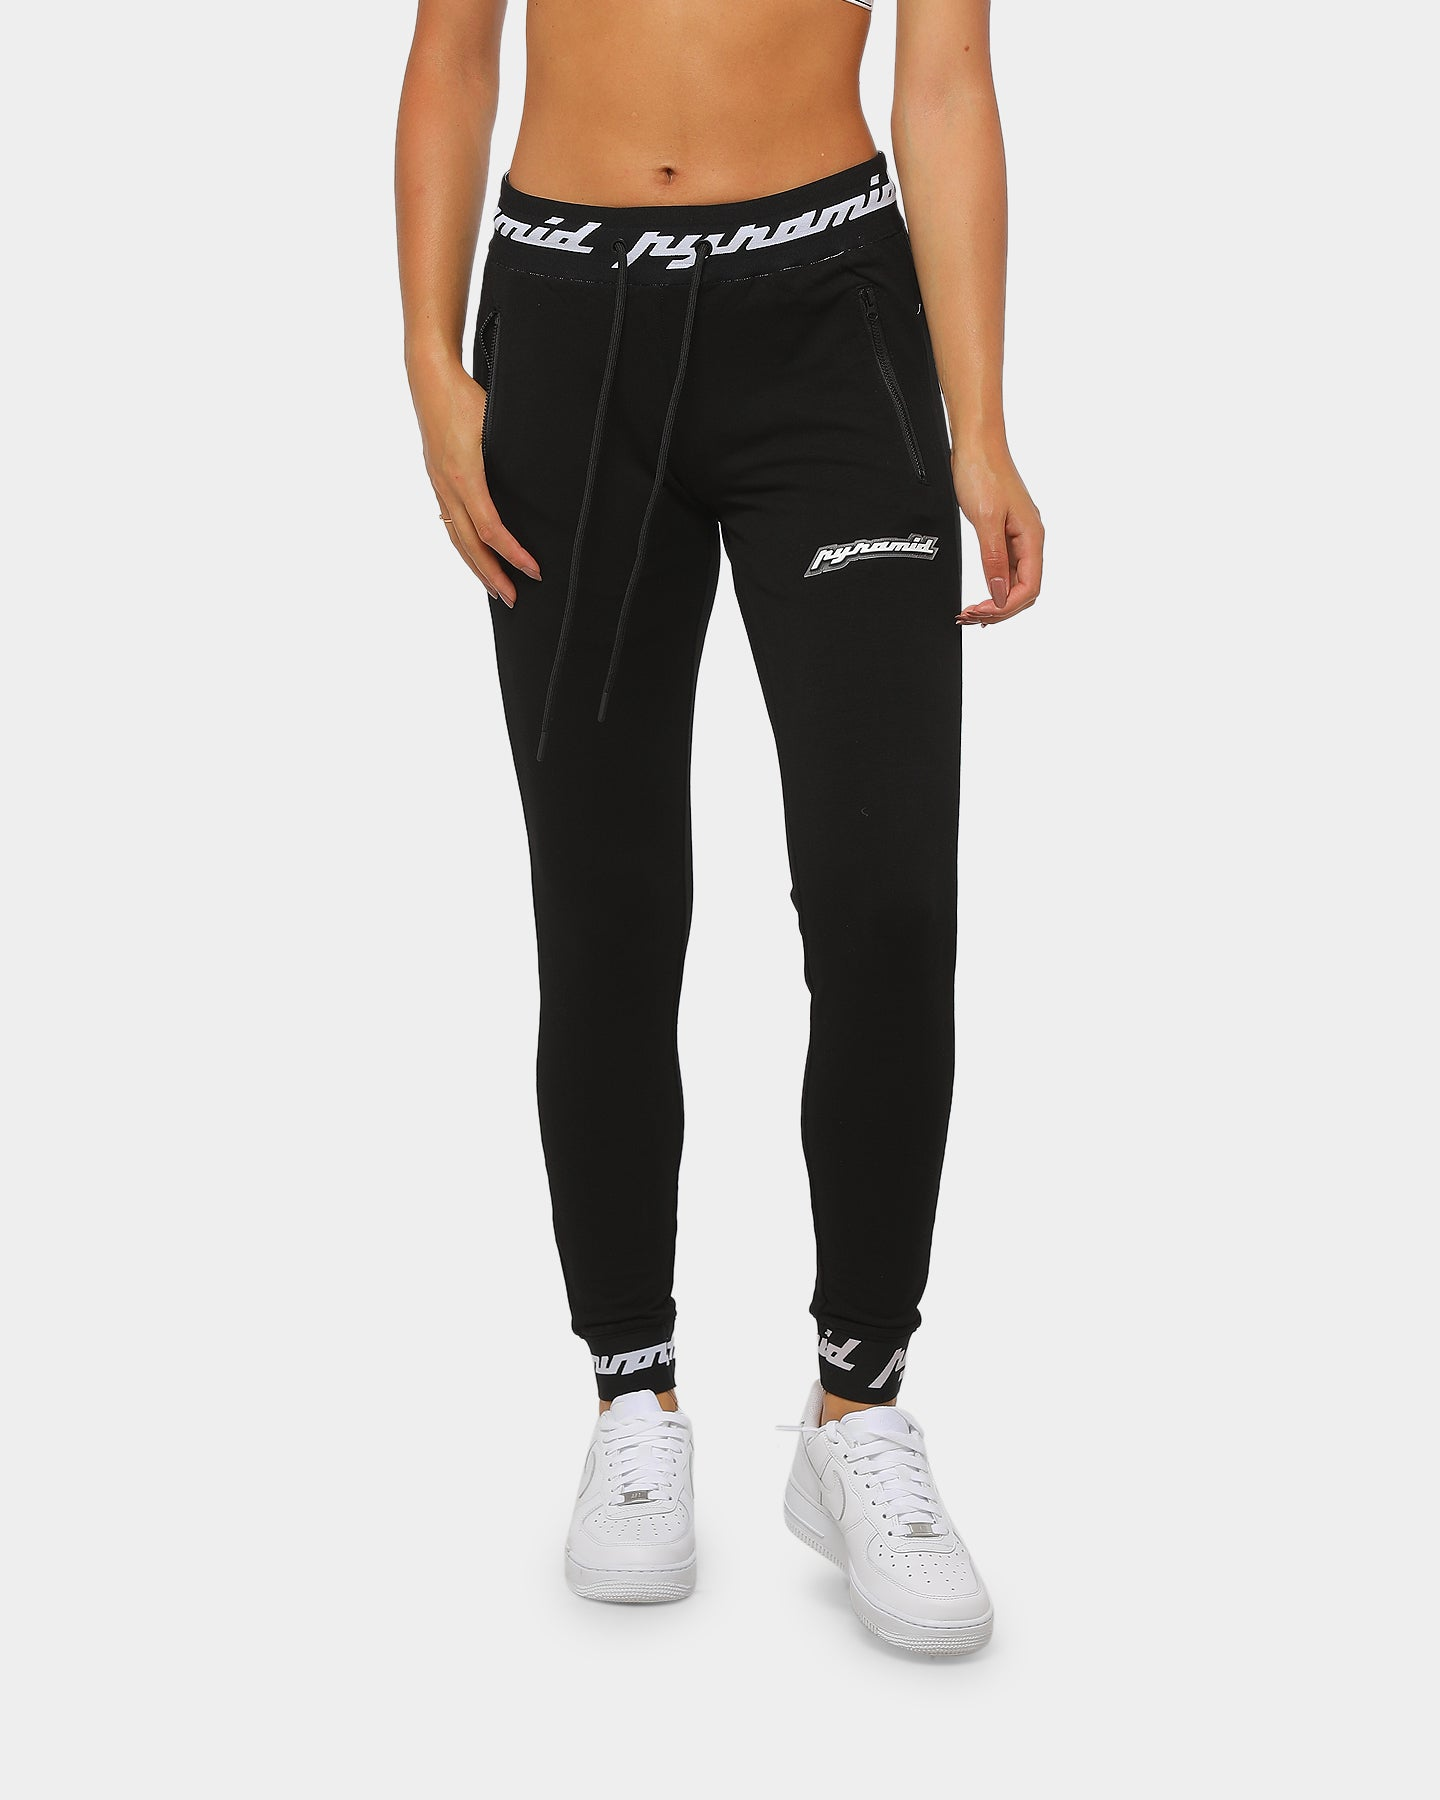 Black Pyramid Black Articulated Knee Jogging Pants